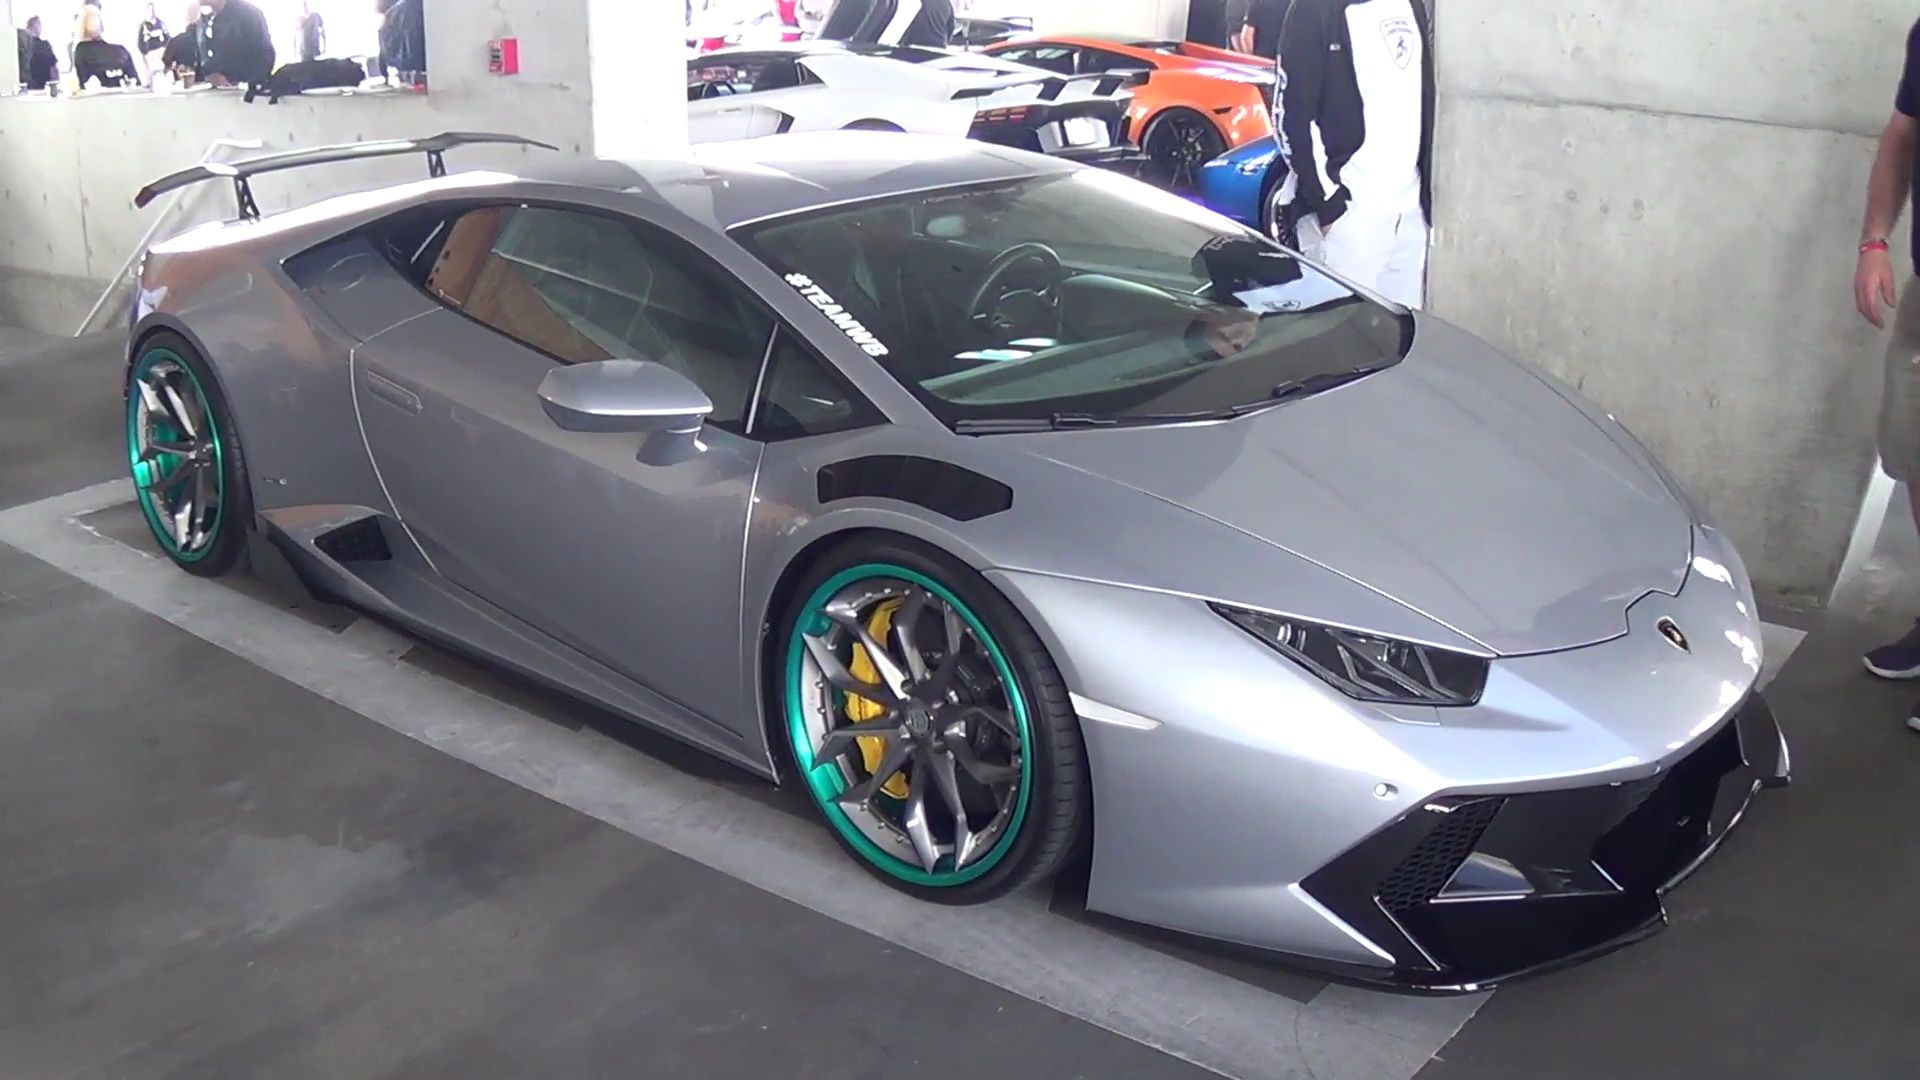 Charming Silver Lamborghini Huracan Novara On HRE Wheels #cars #car #lamborghini # Huracan #lamborghinihuracan #novara #vorsteiner #tuning #cartuning  #hrewheels ...